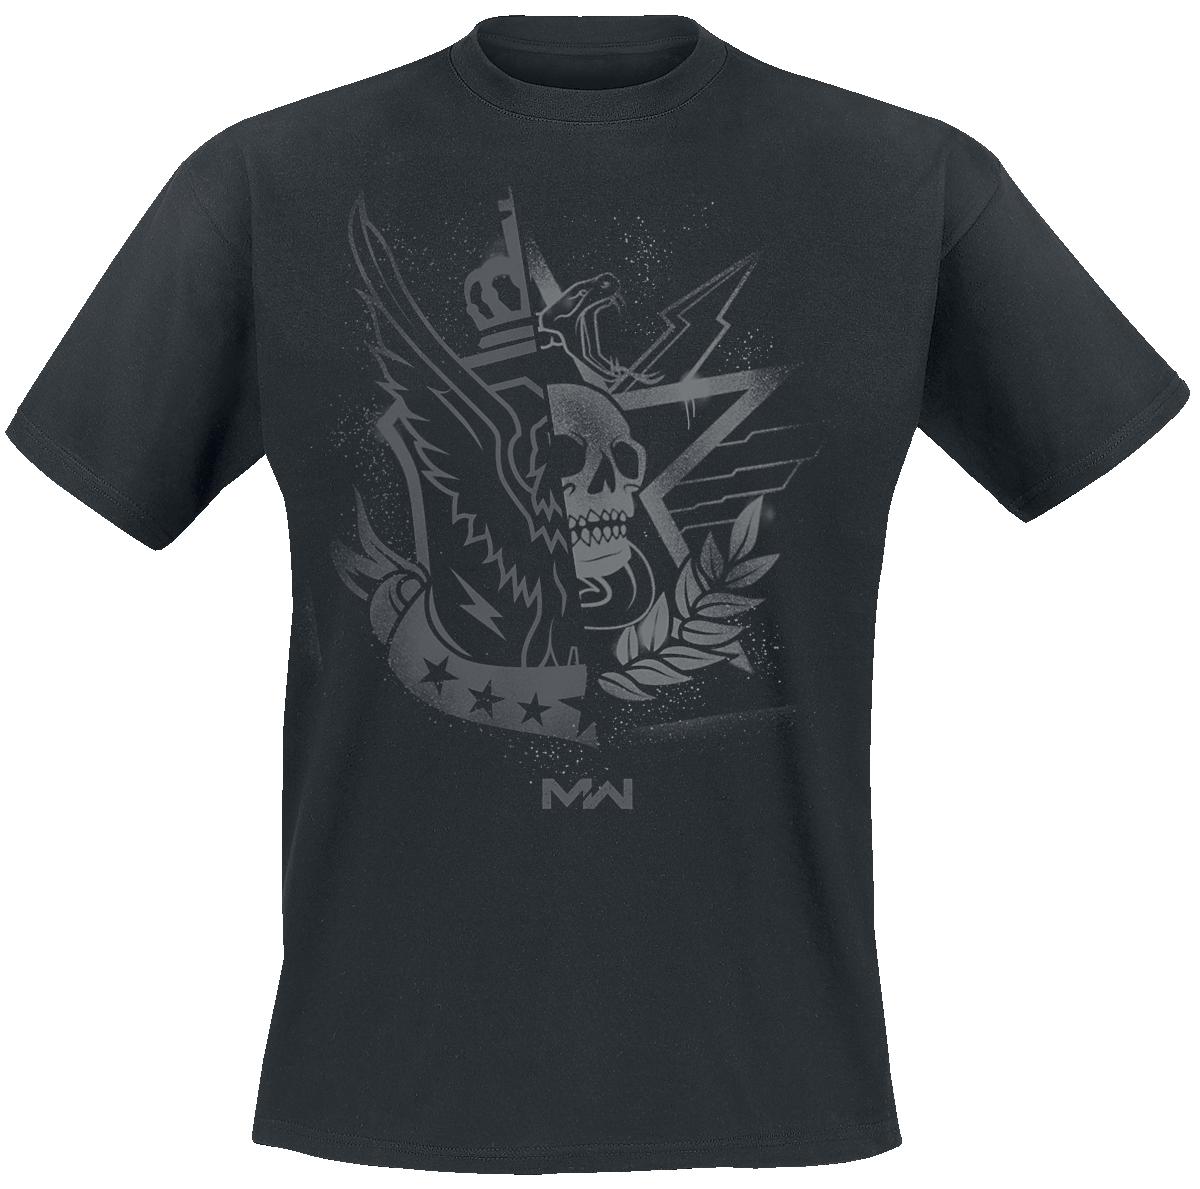 Call Of Duty - Modern Warfare - Fraction Break - T-Shirt - black image